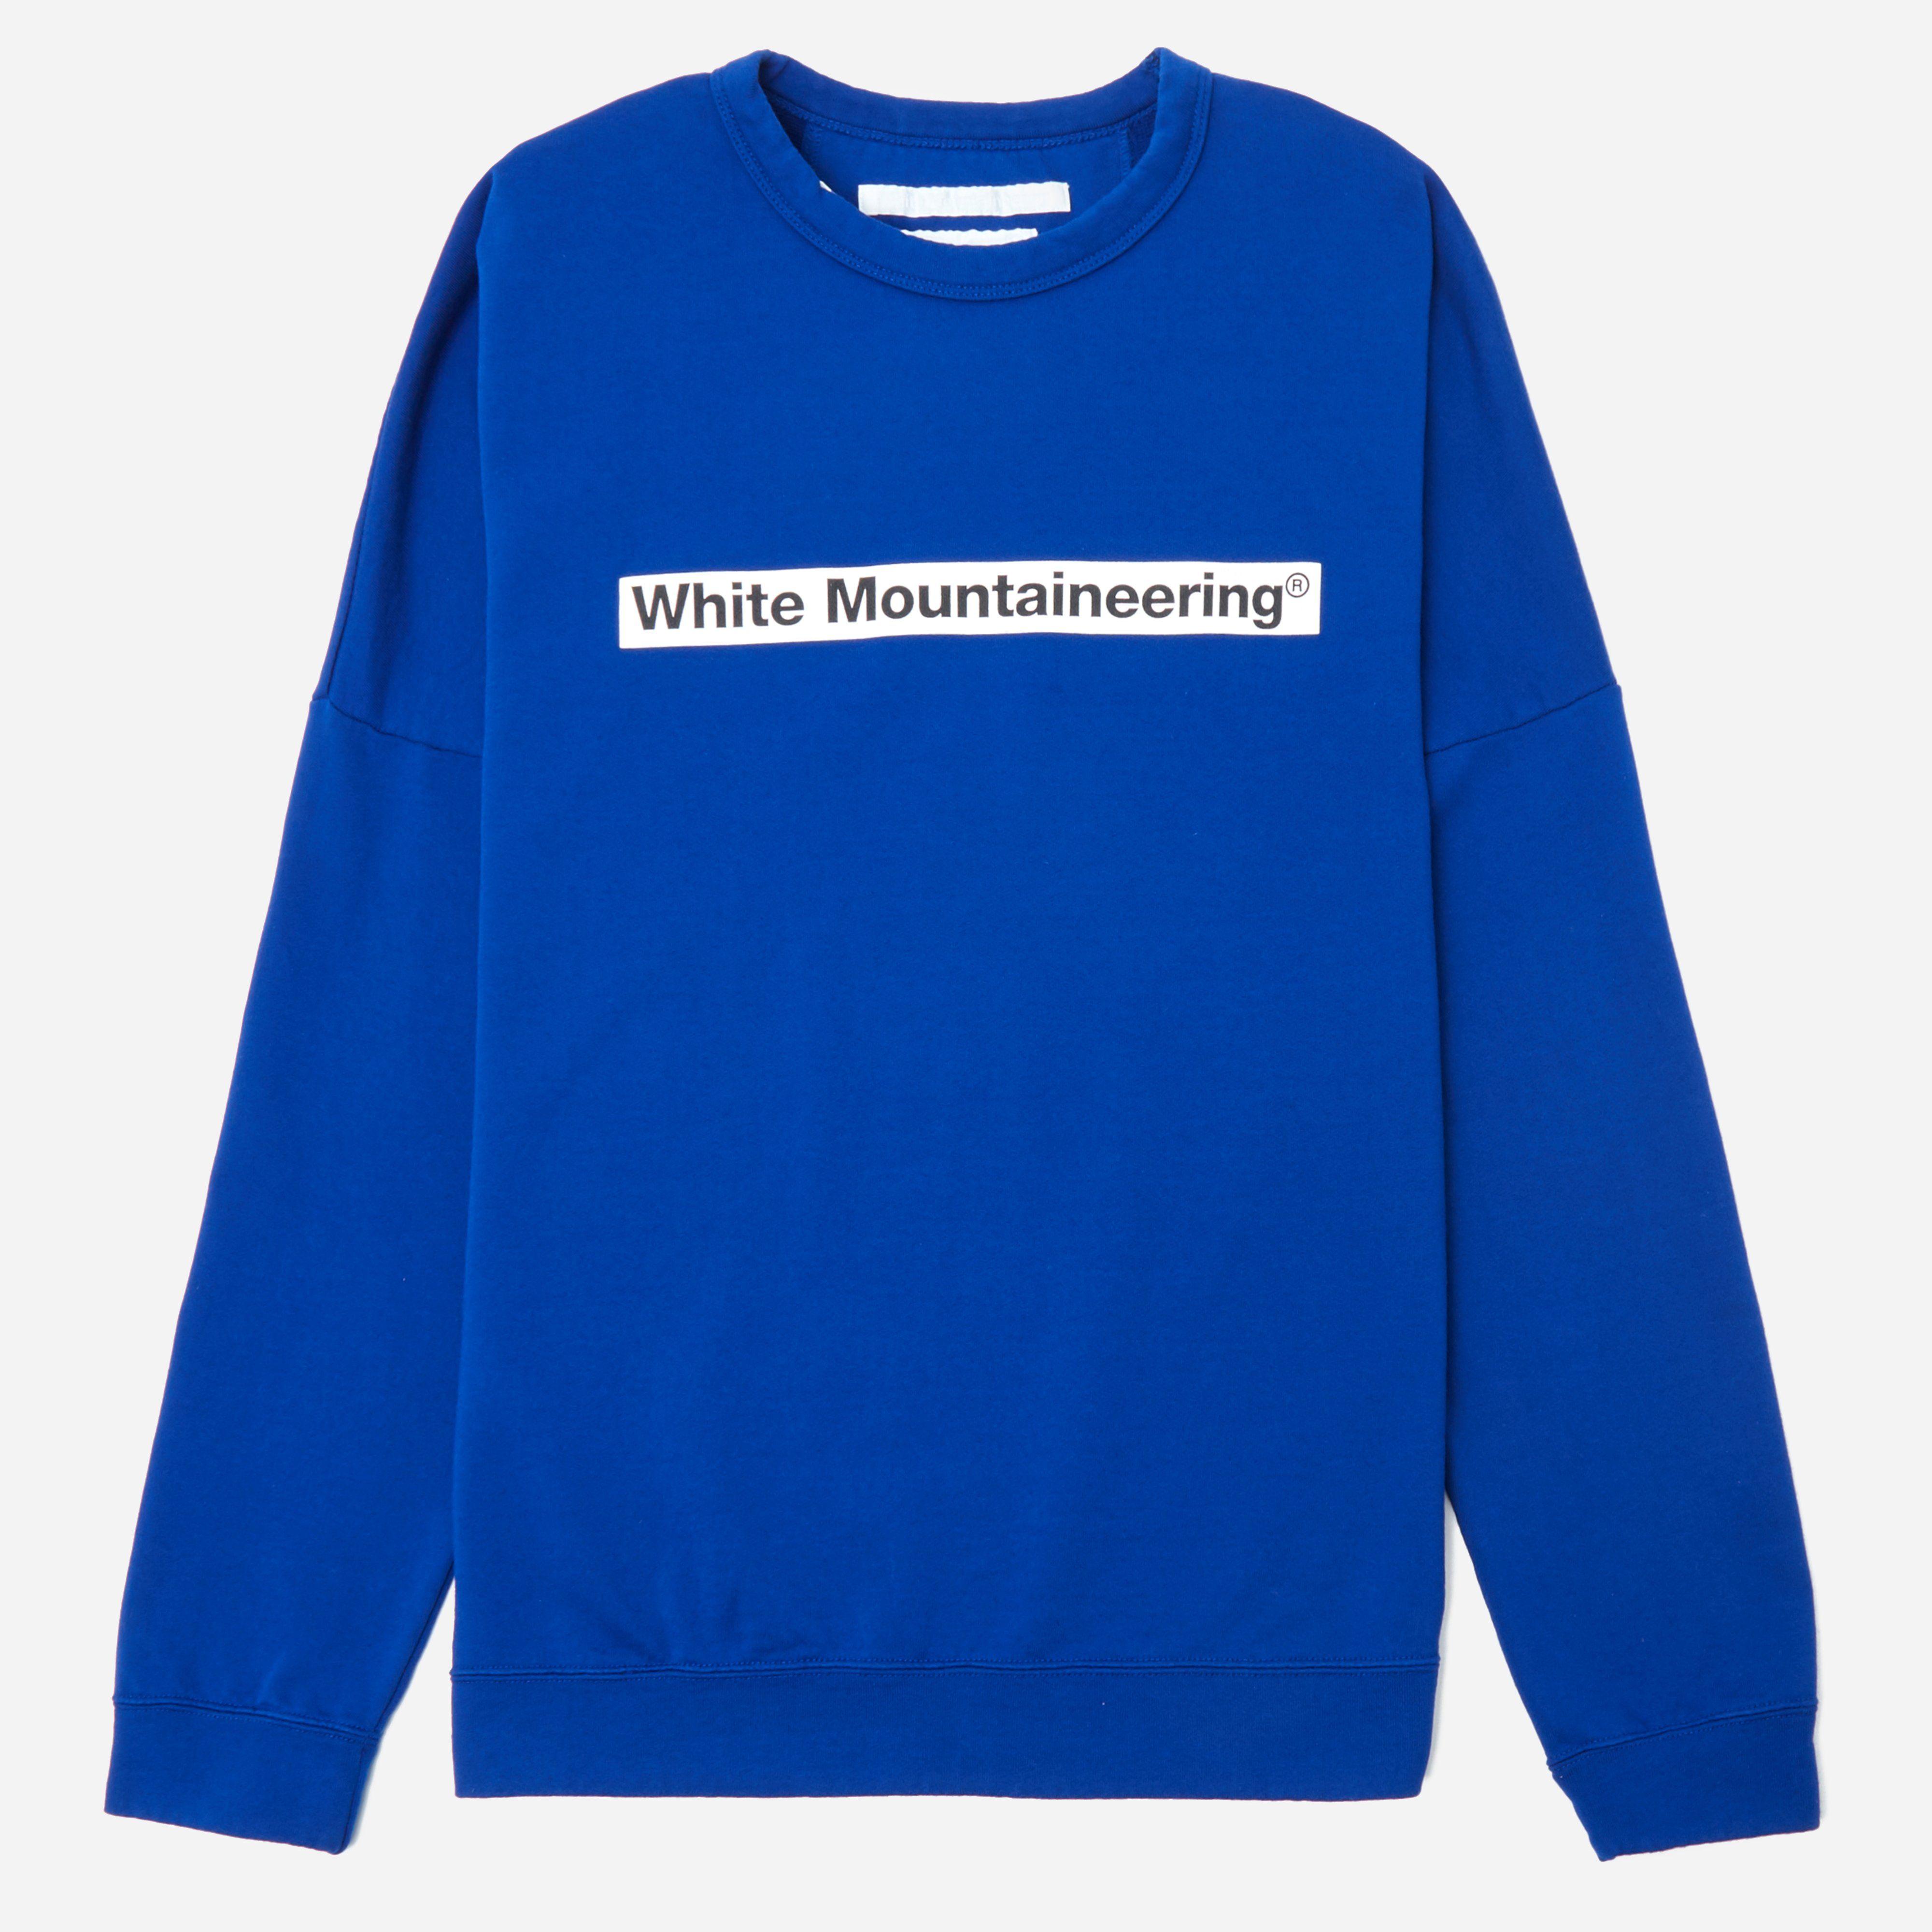 White Mountaineering Drop Shoulder Logo Sweatshirt